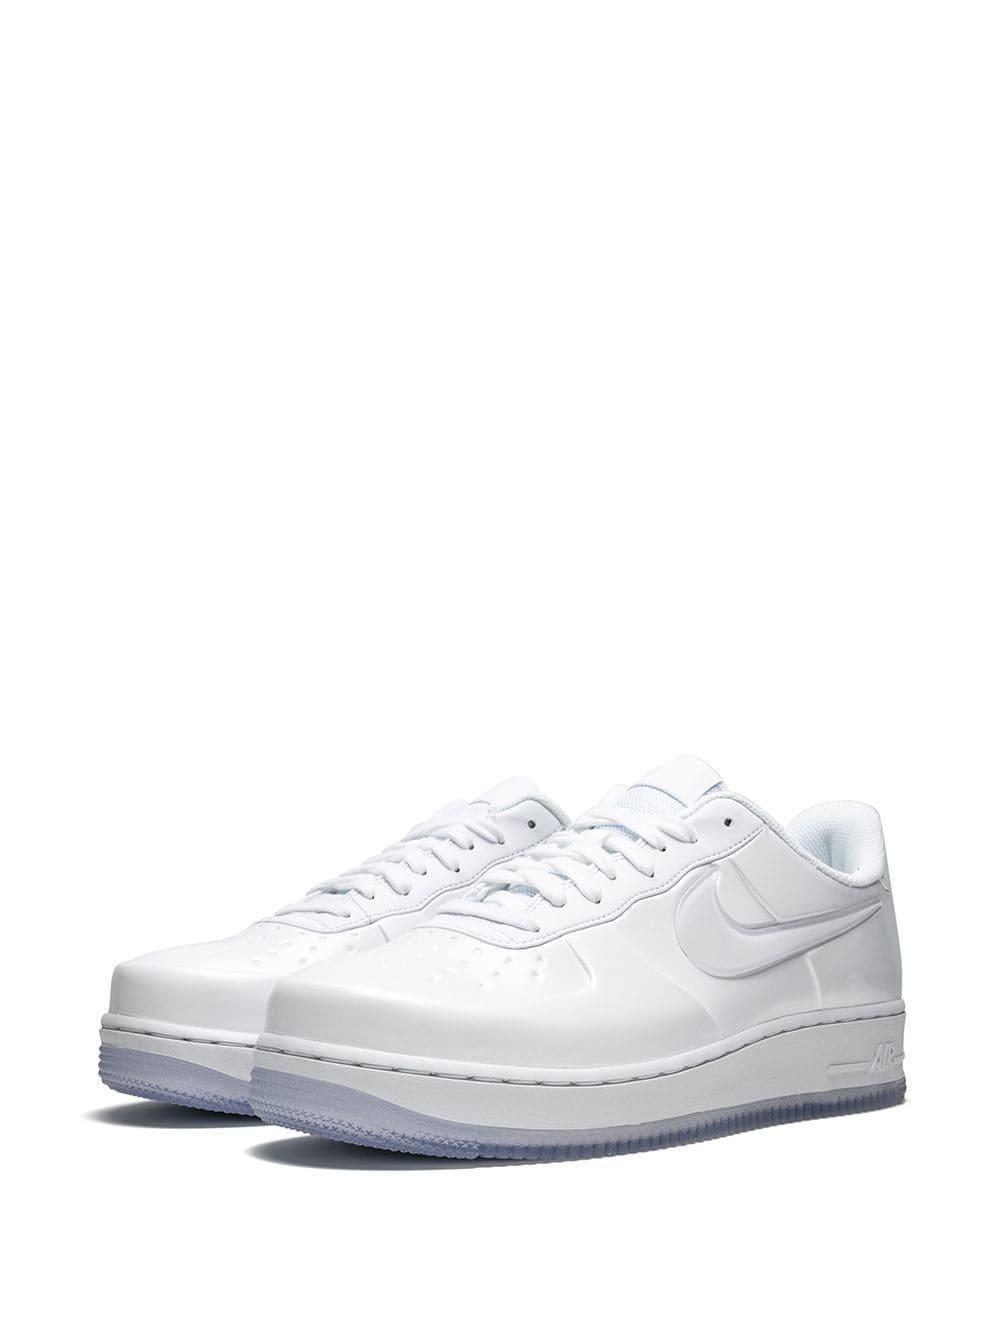 441139c3e4e7e Lyst - Nike Air Force1 Foamposite Pro Cupsole Sneakers in White for Men